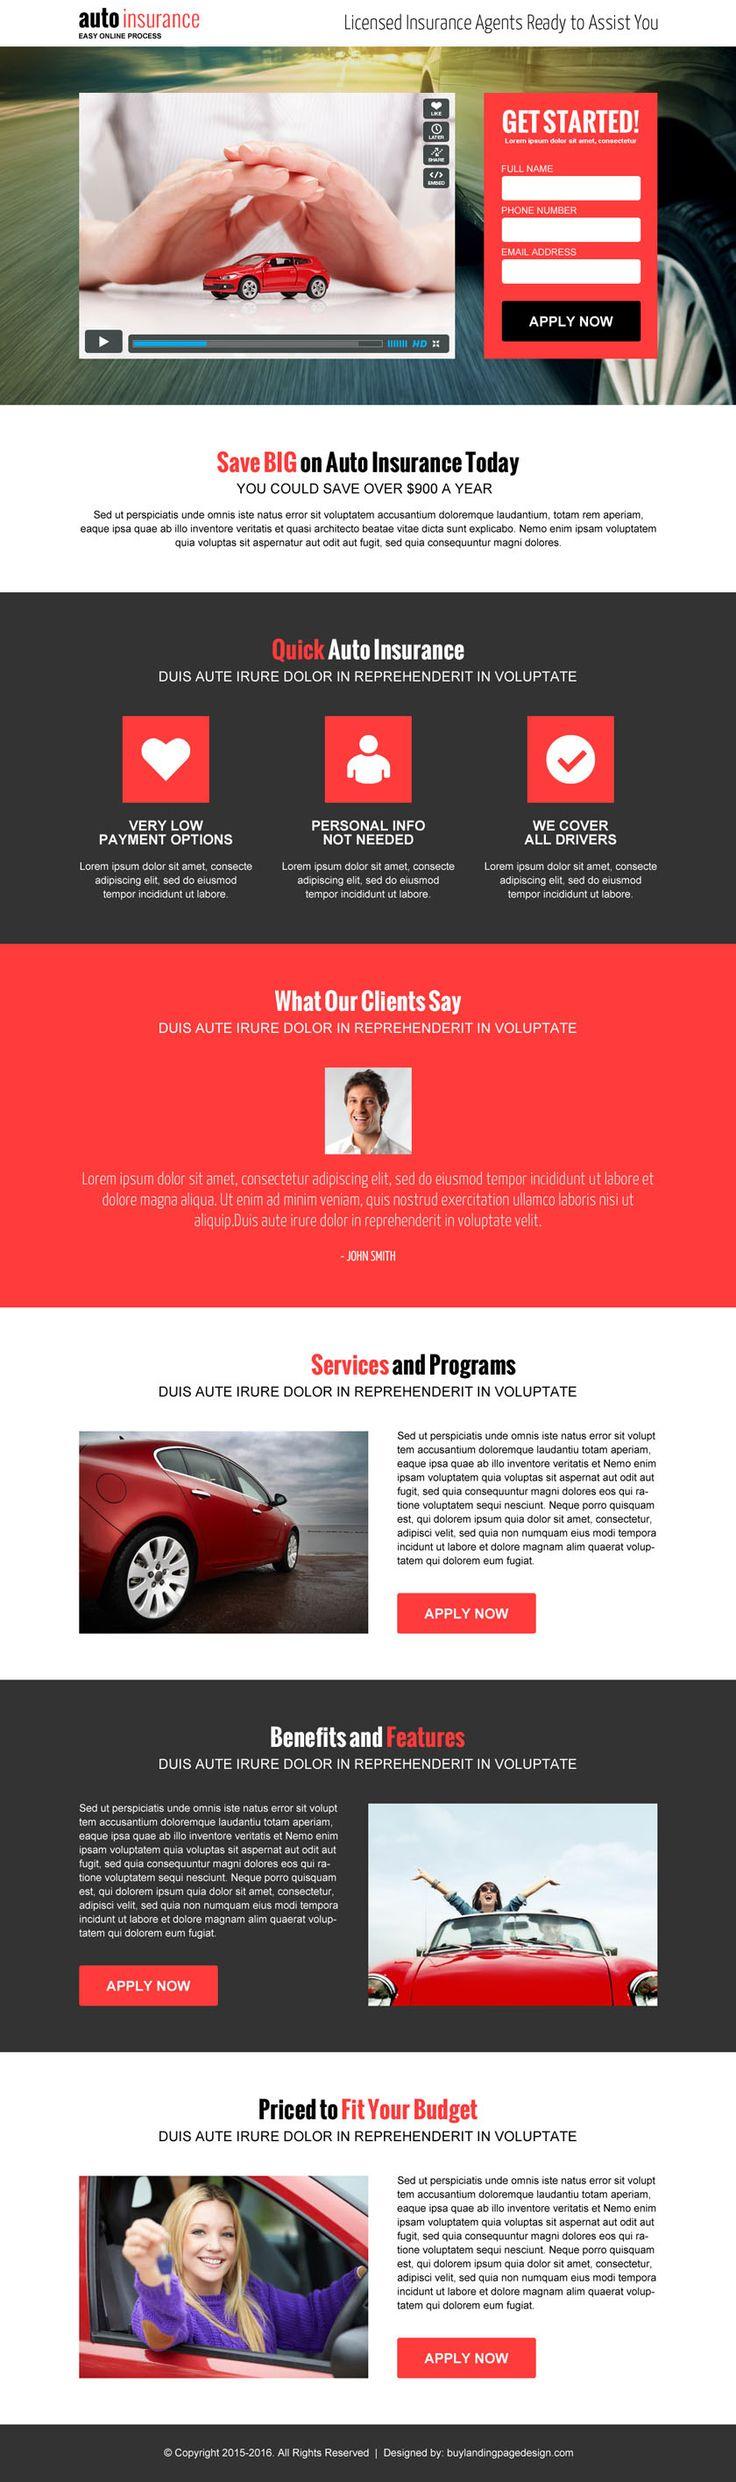 auto-insurance-video-responsive-lp-012 | Auto Insurance responsive landing page design preview.